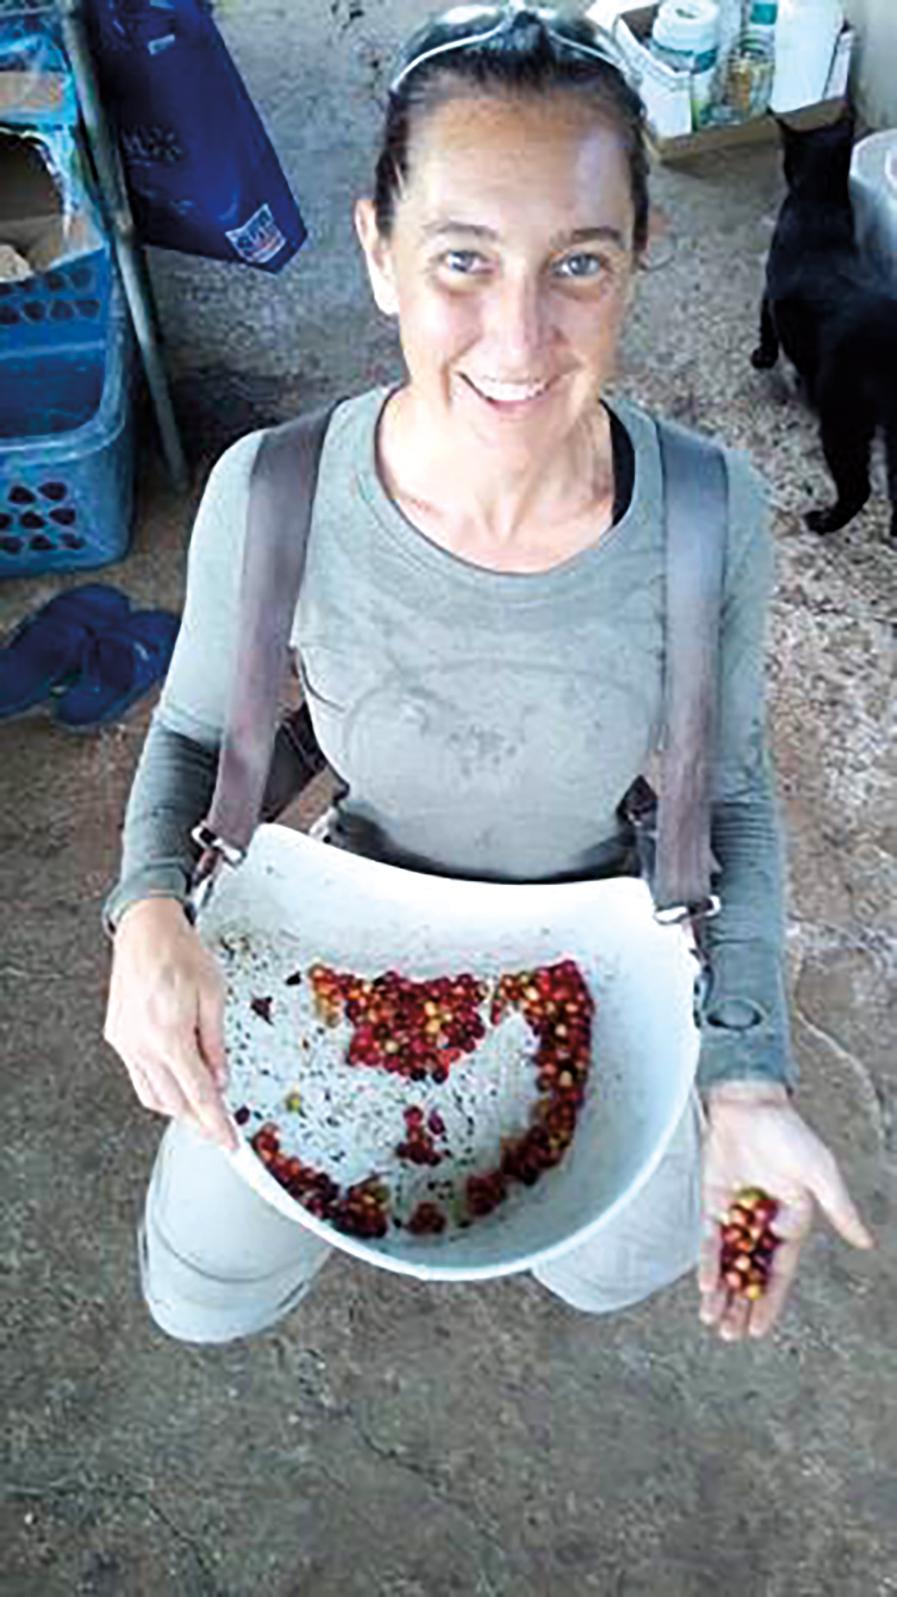 Steph Sorowka '06 picking coffee beans at La Buena Vida, Captain Cook, Hawaii.